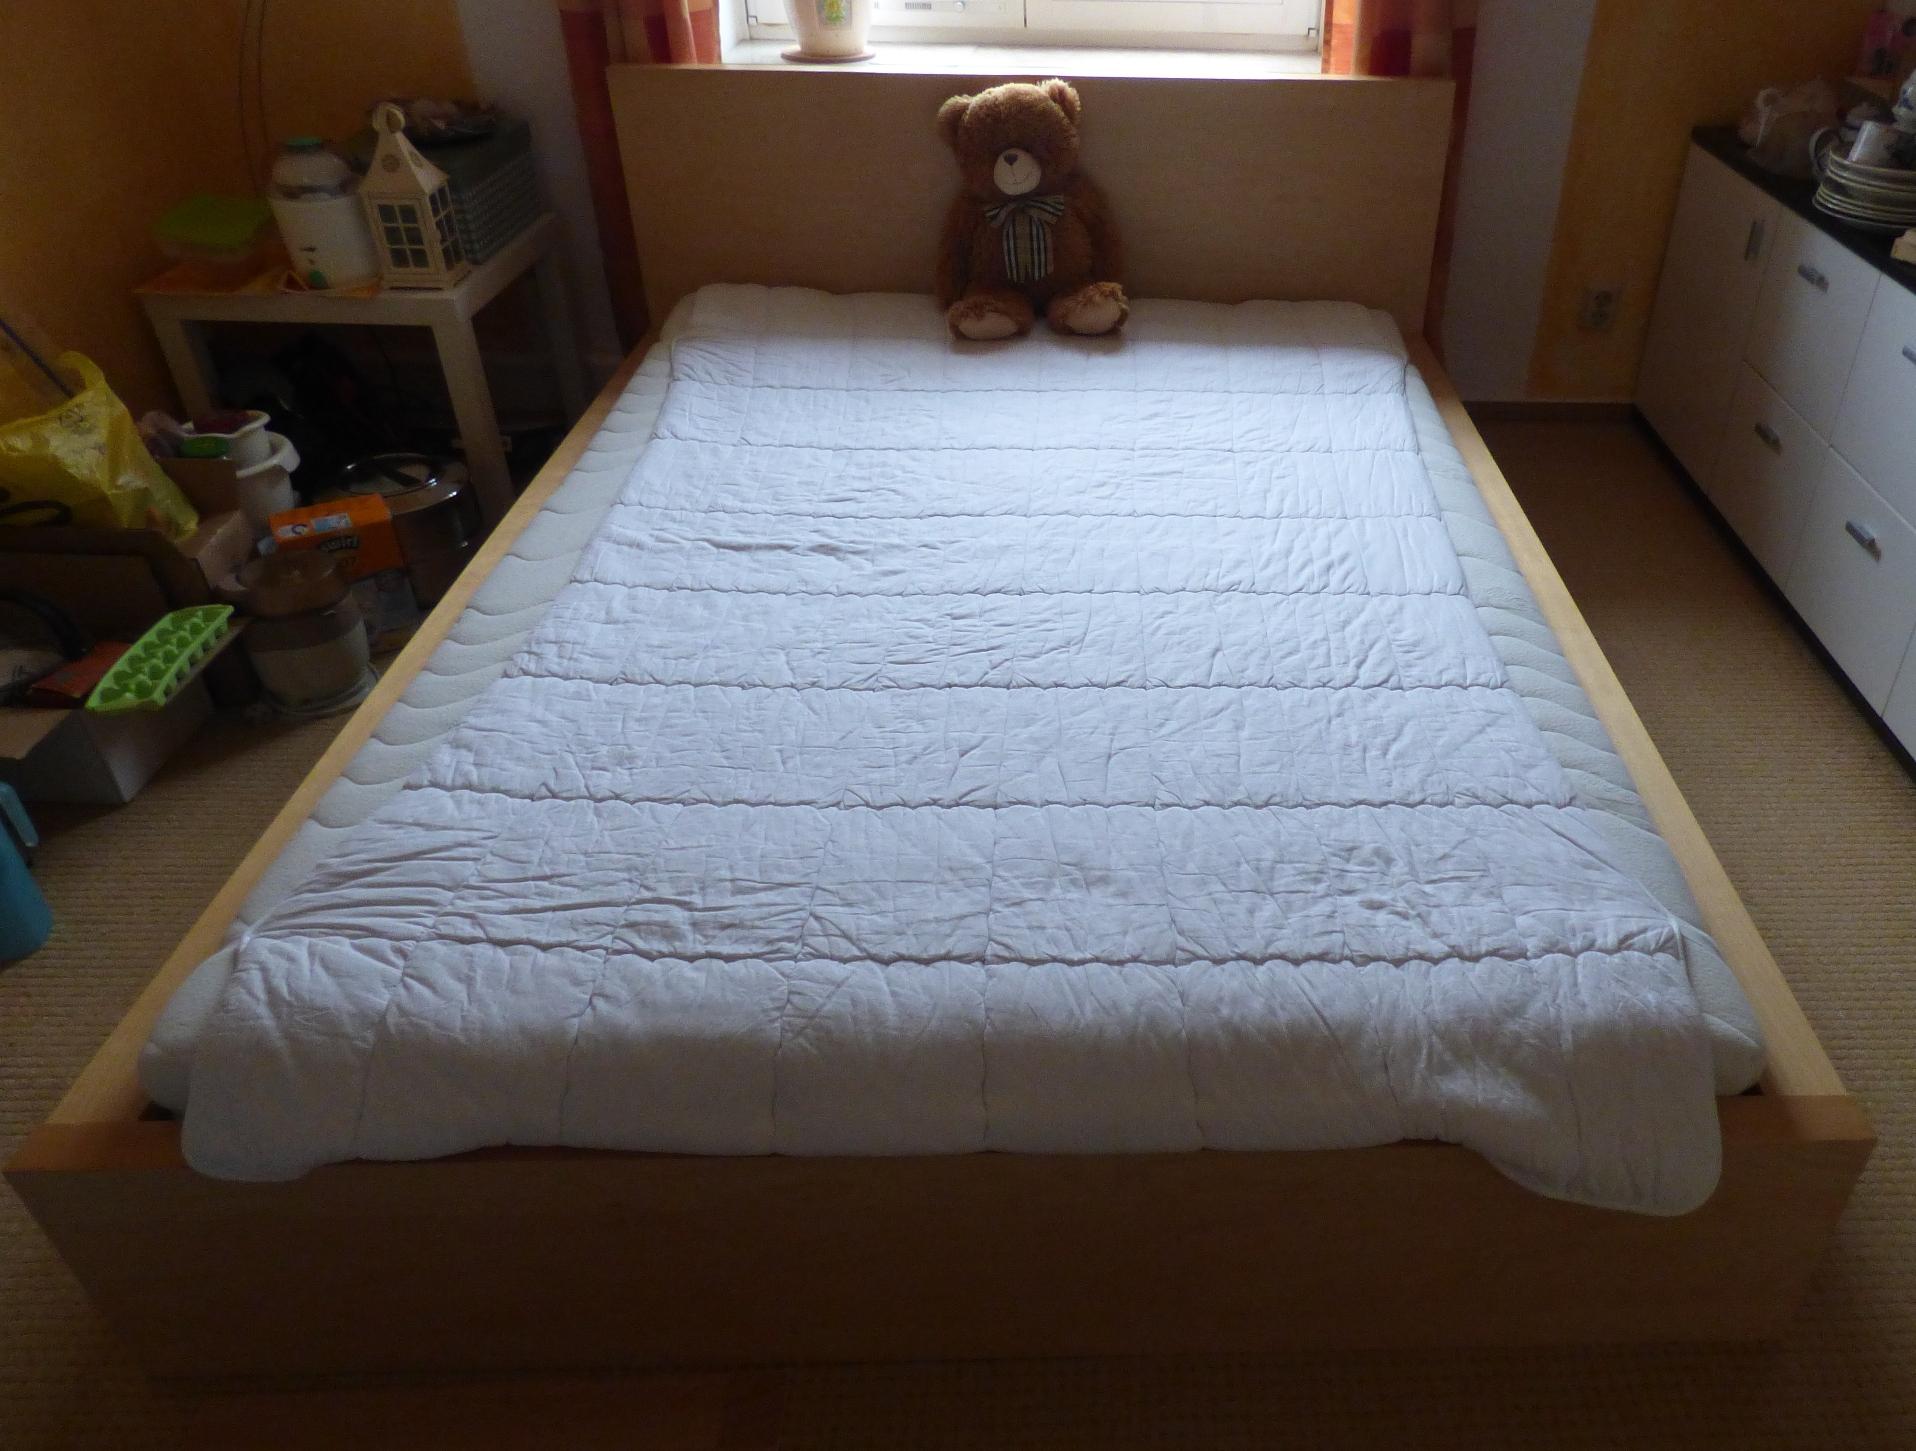 doppelbett holz buche hell mit lattenrost 200x140 cm liegefl che ohne matratze ebay. Black Bedroom Furniture Sets. Home Design Ideas